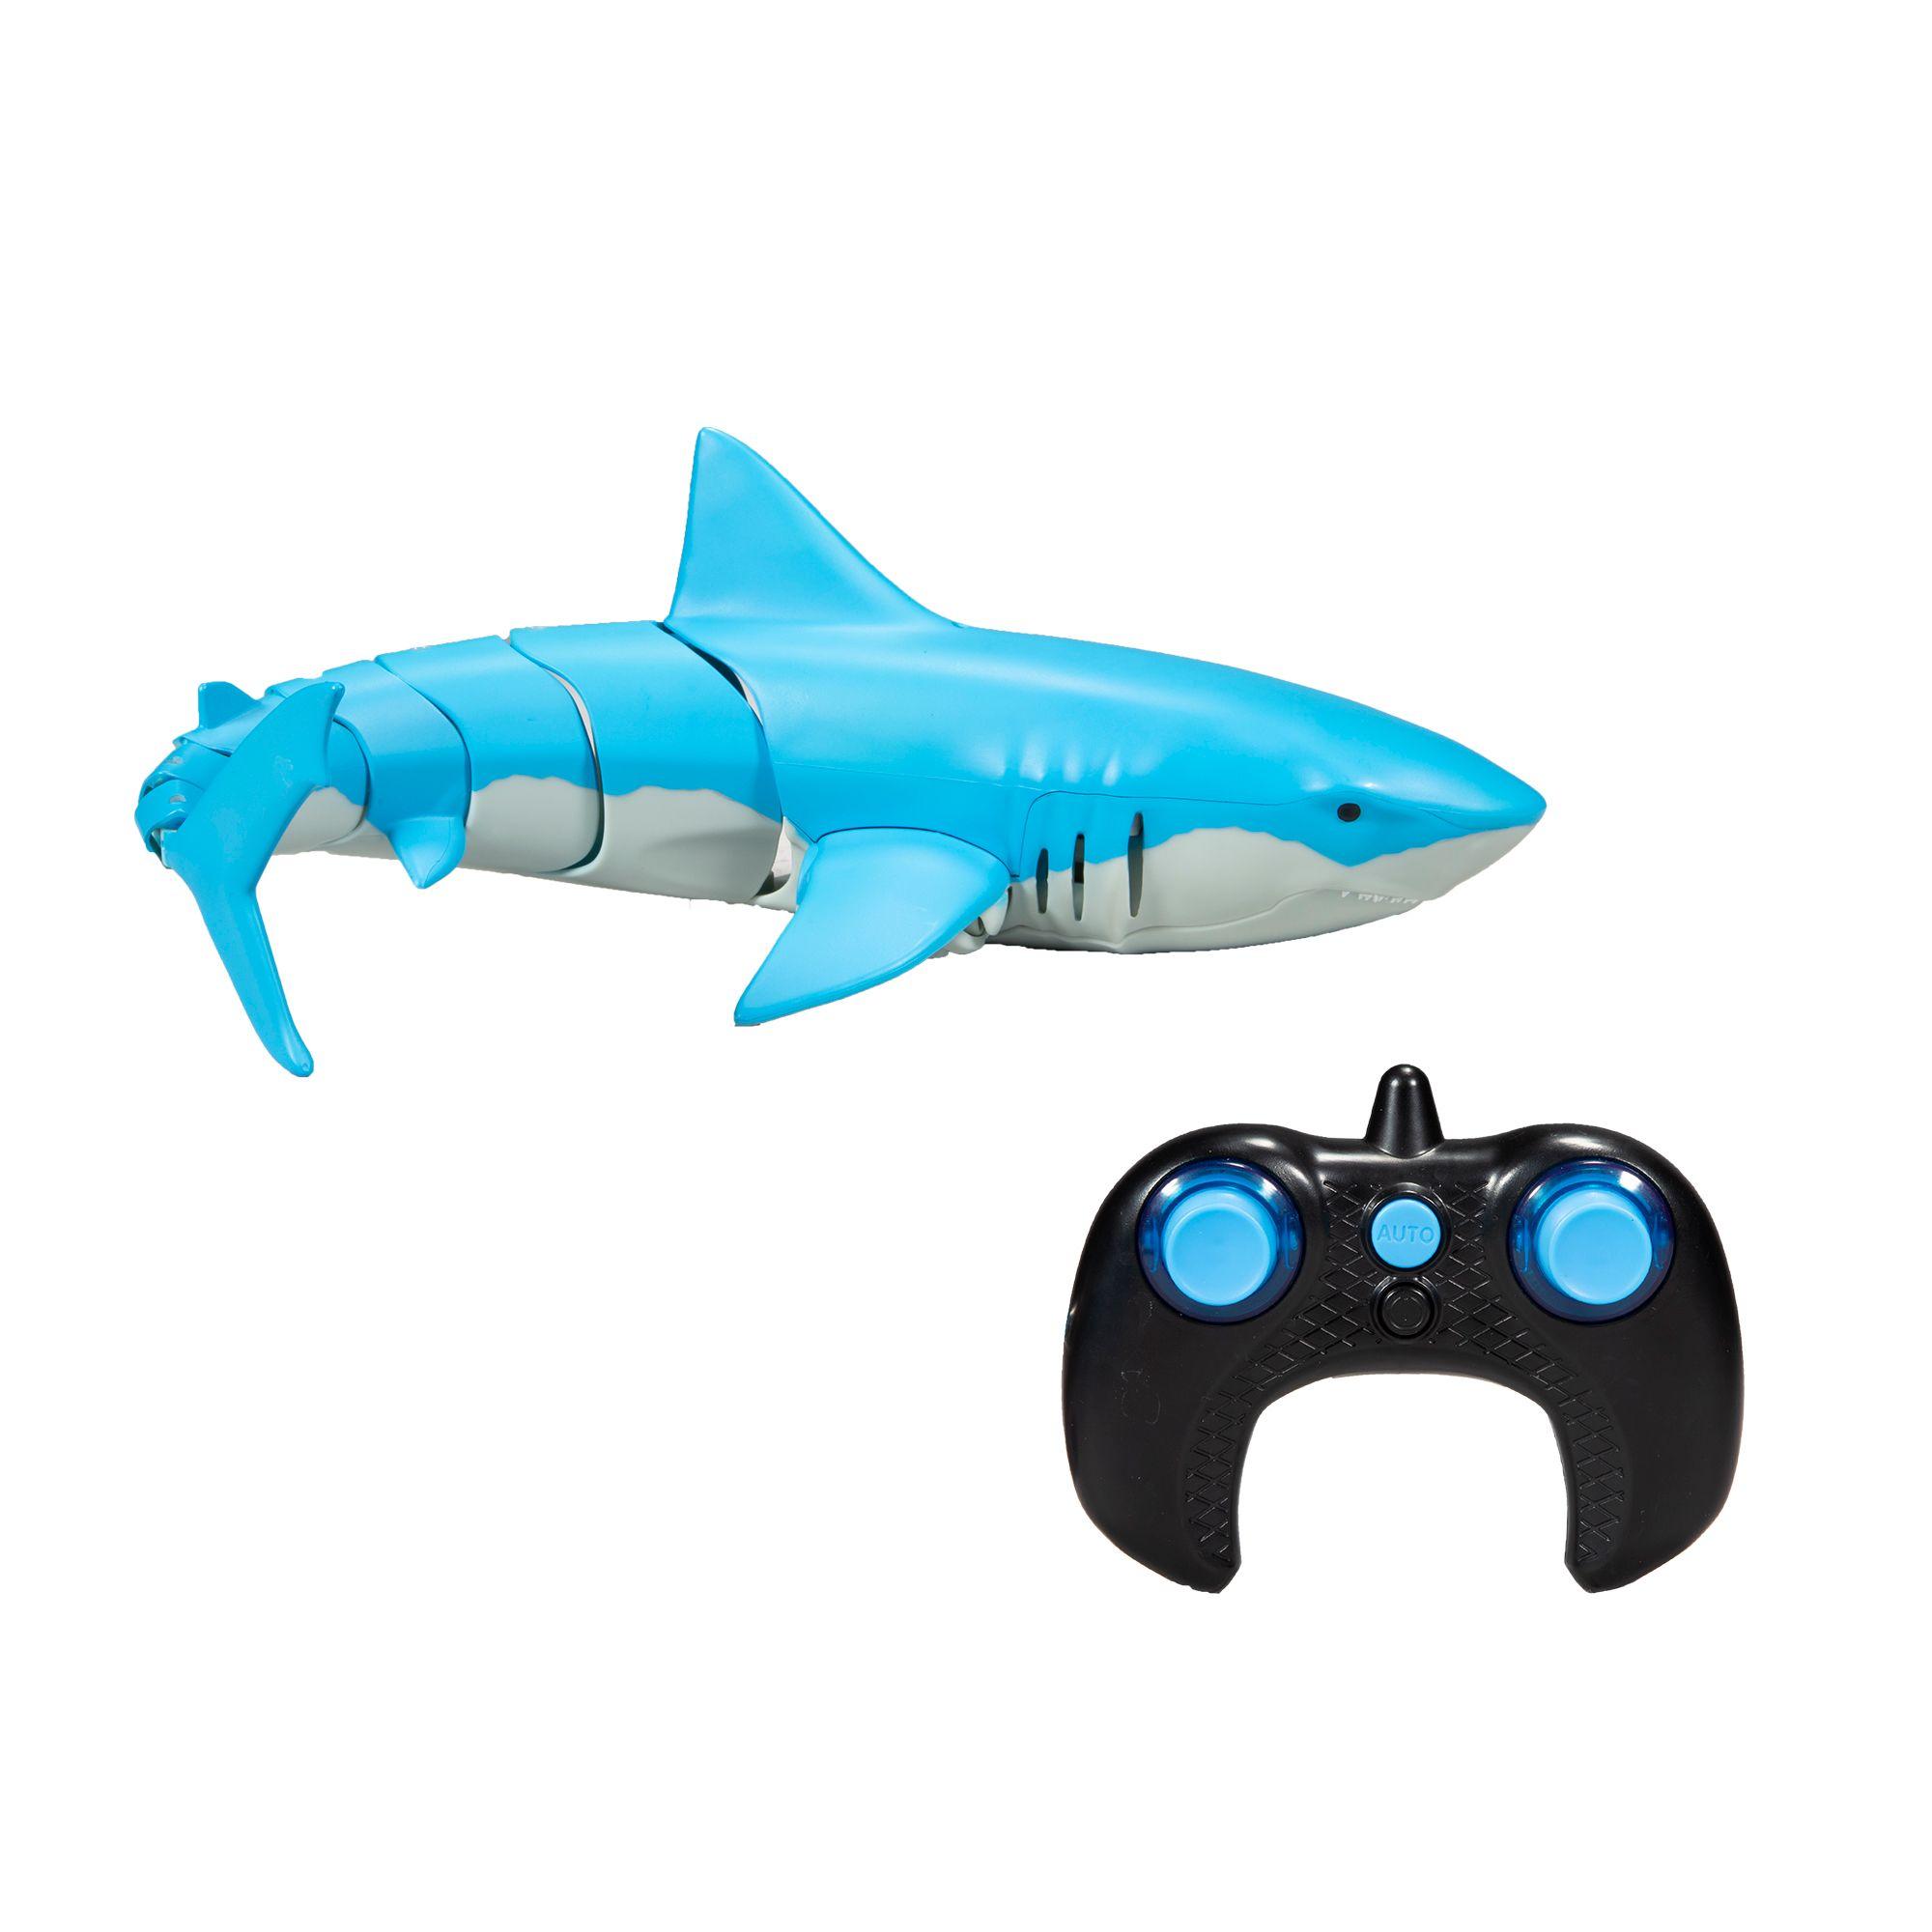 Mcfarlane Rc Shark Shark in 2020 Remote